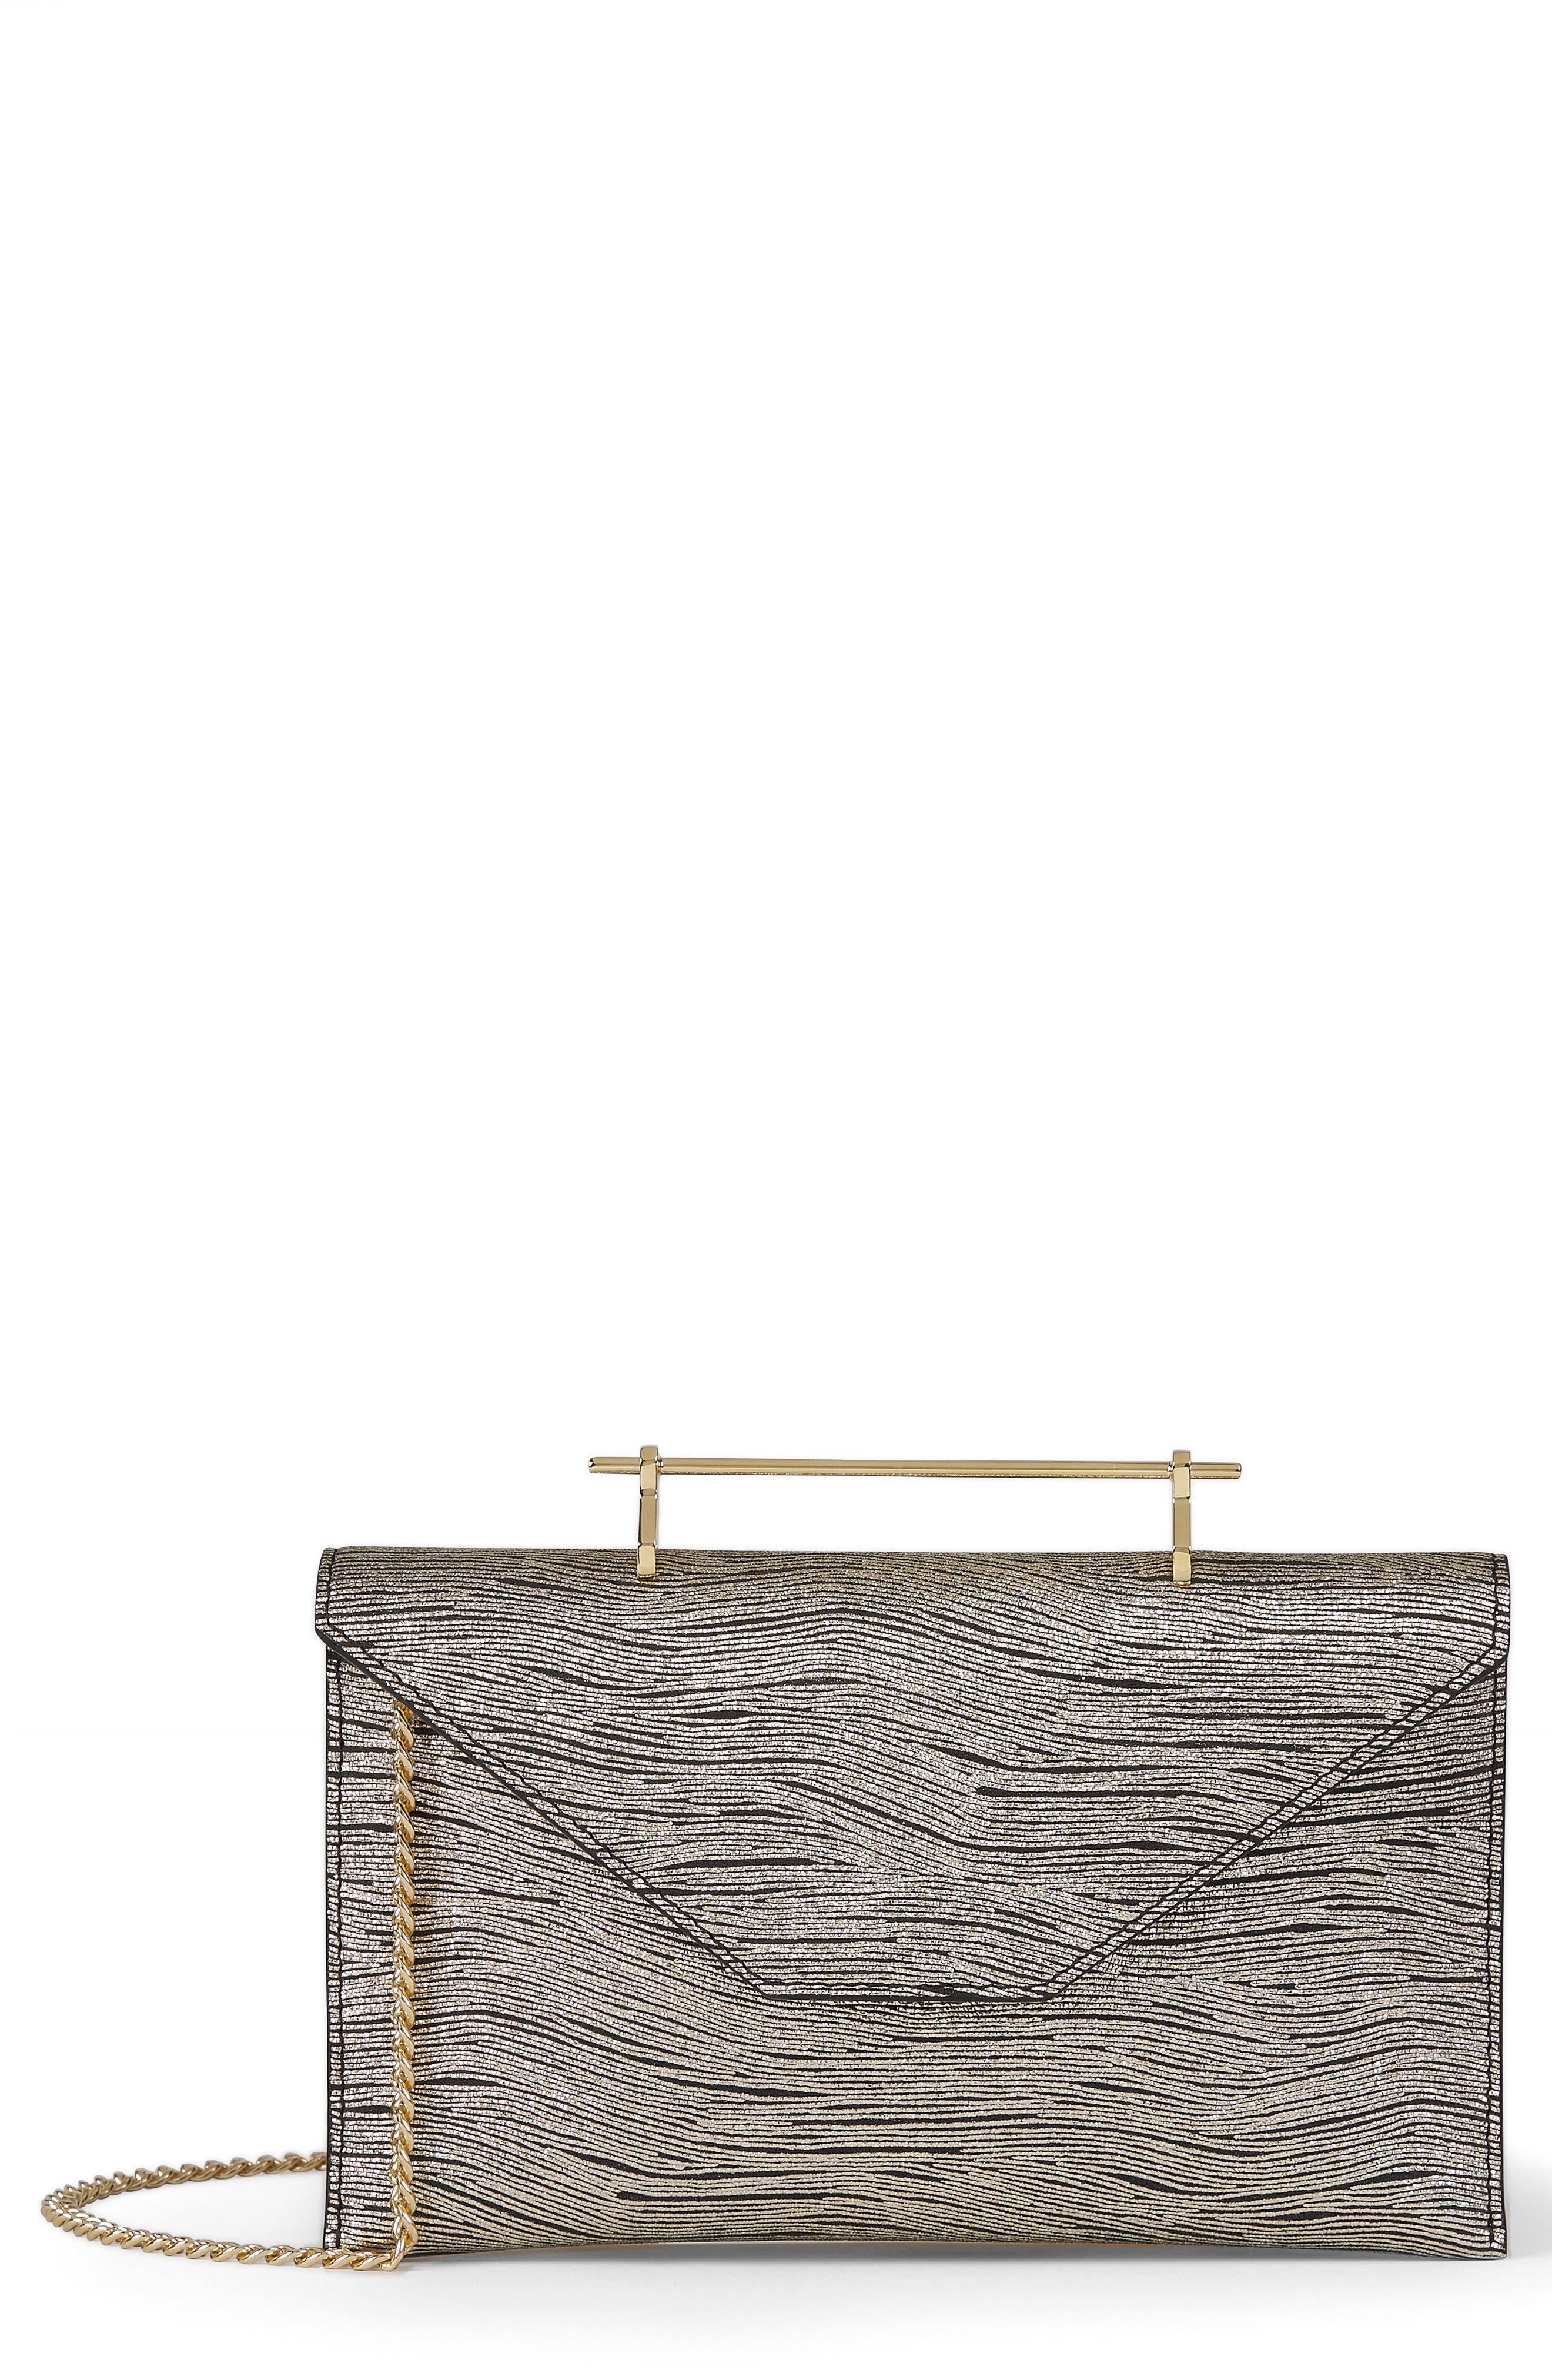 Annabelle Metallic Calfskin Leather Clutch,                         Main,                         color, Metallic Wave Gold